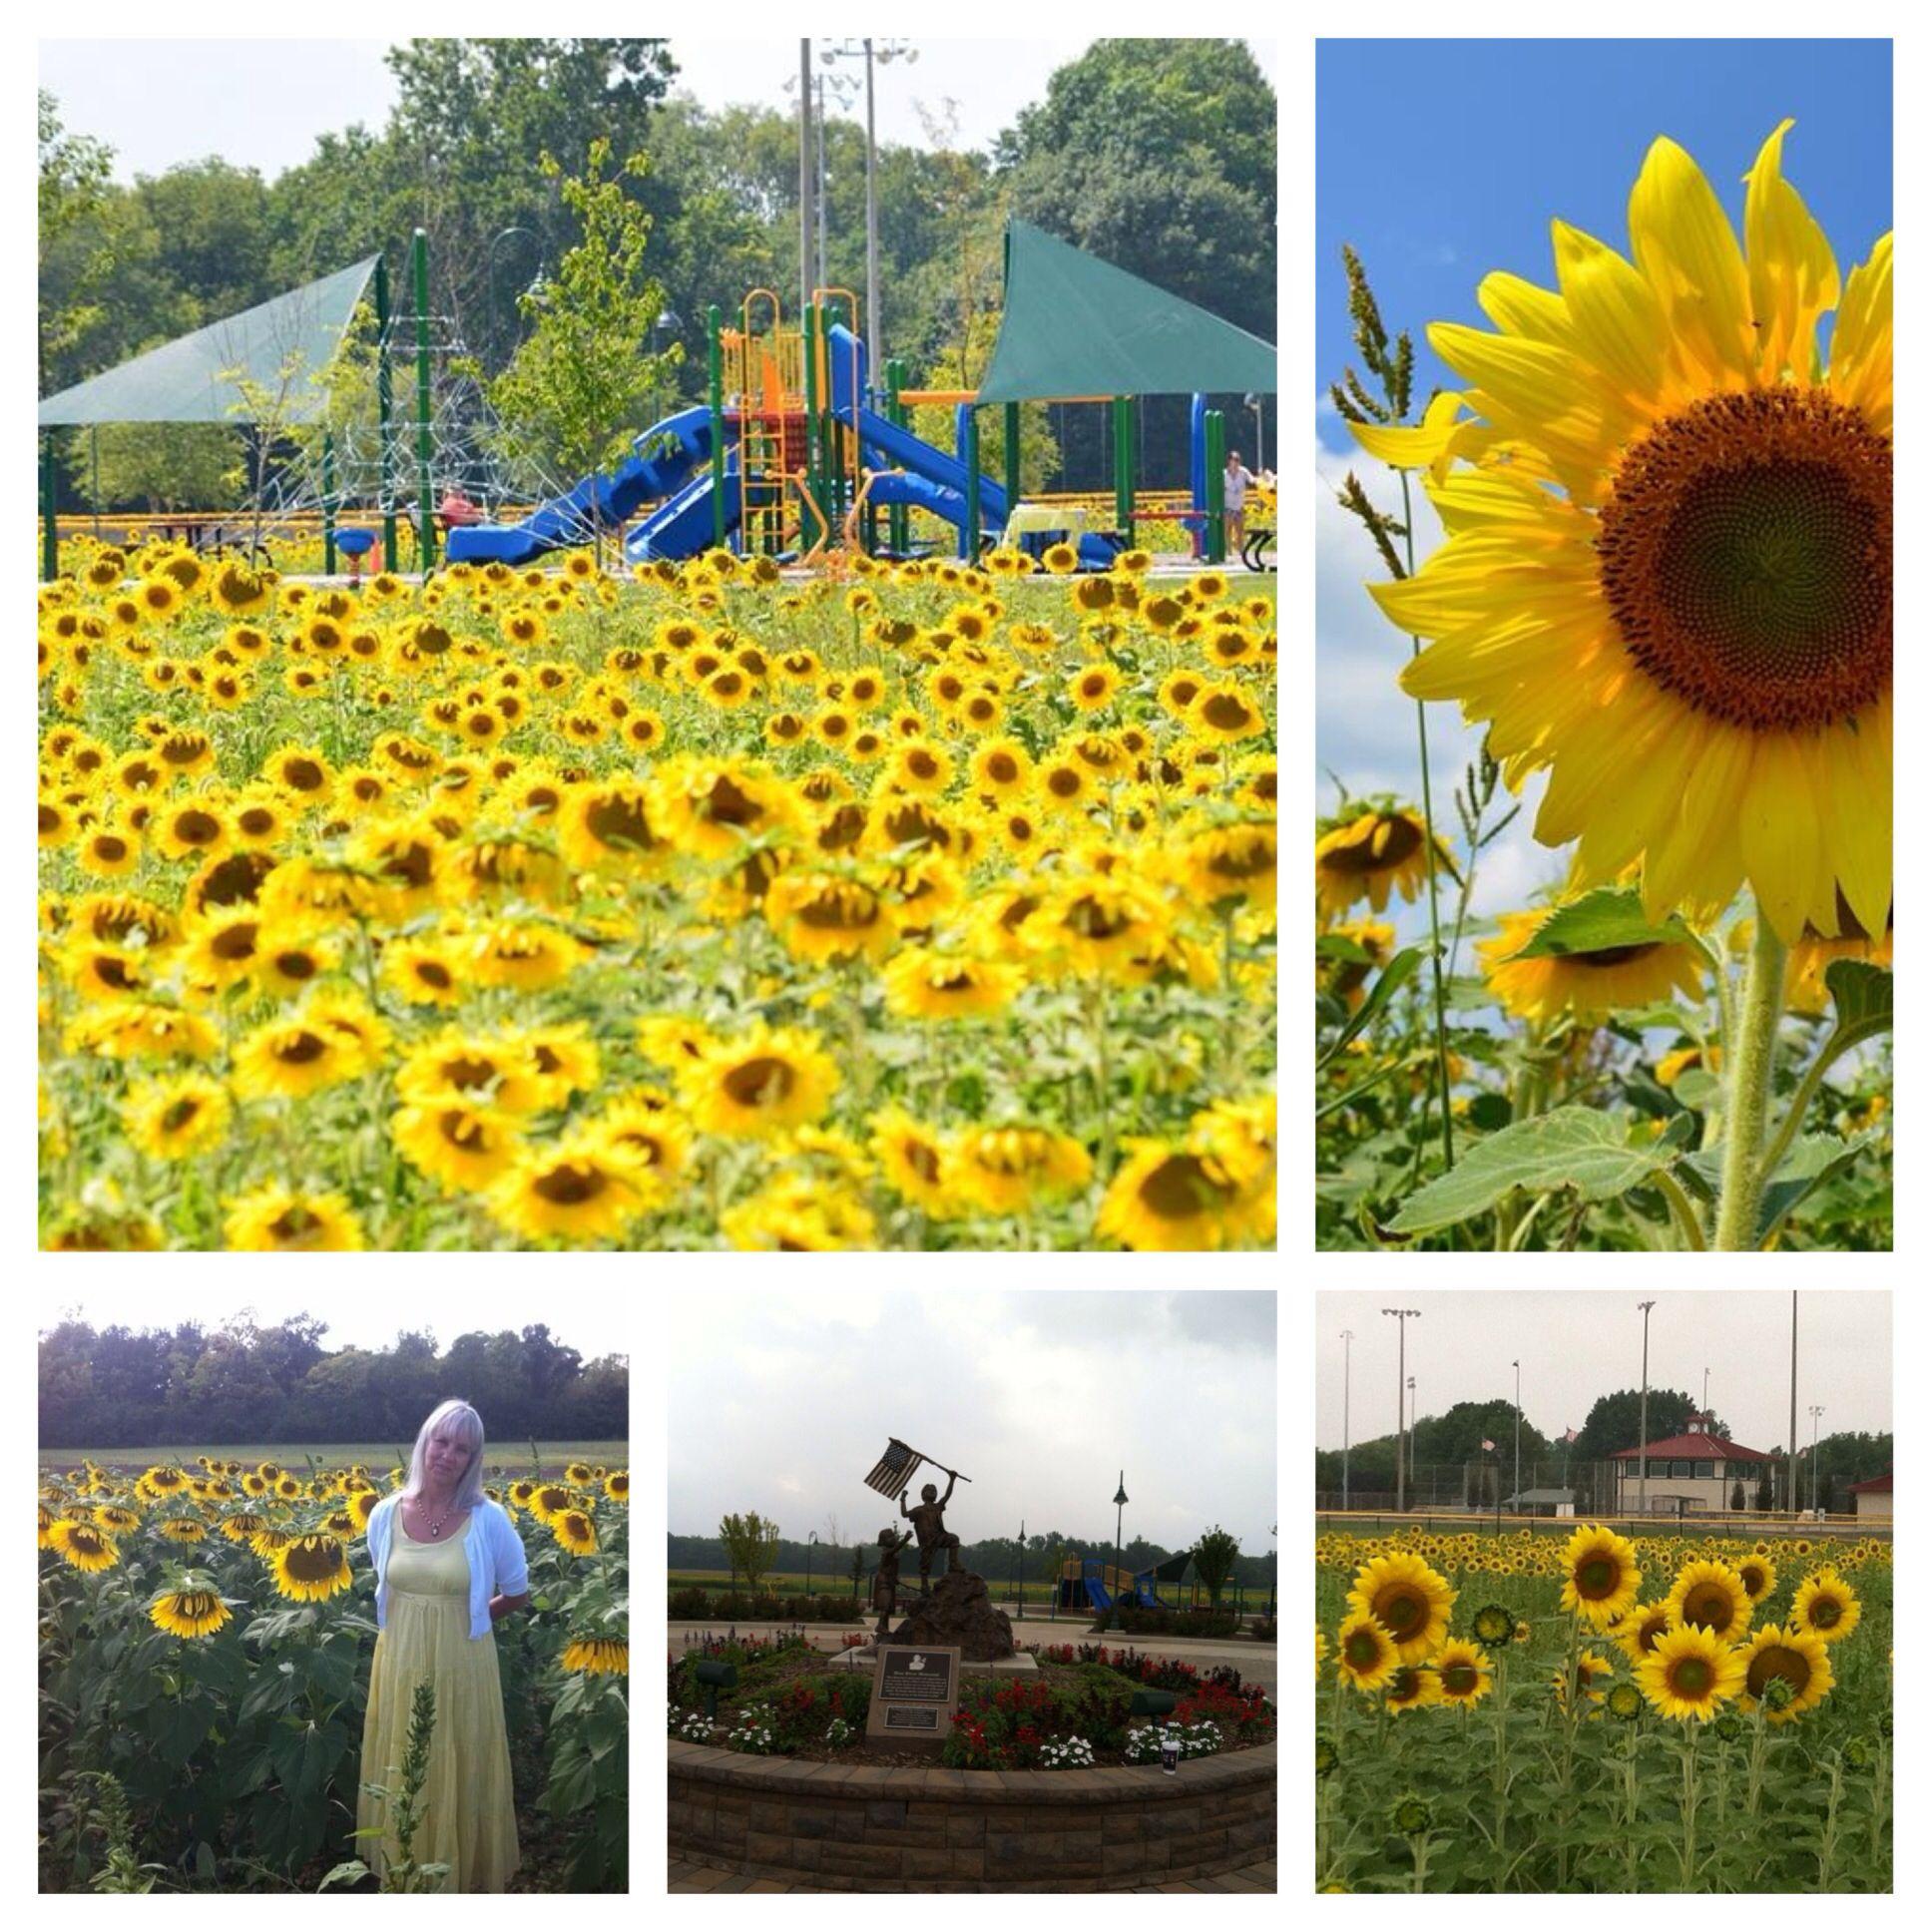 Blue River Memorial Park in Shelbyville